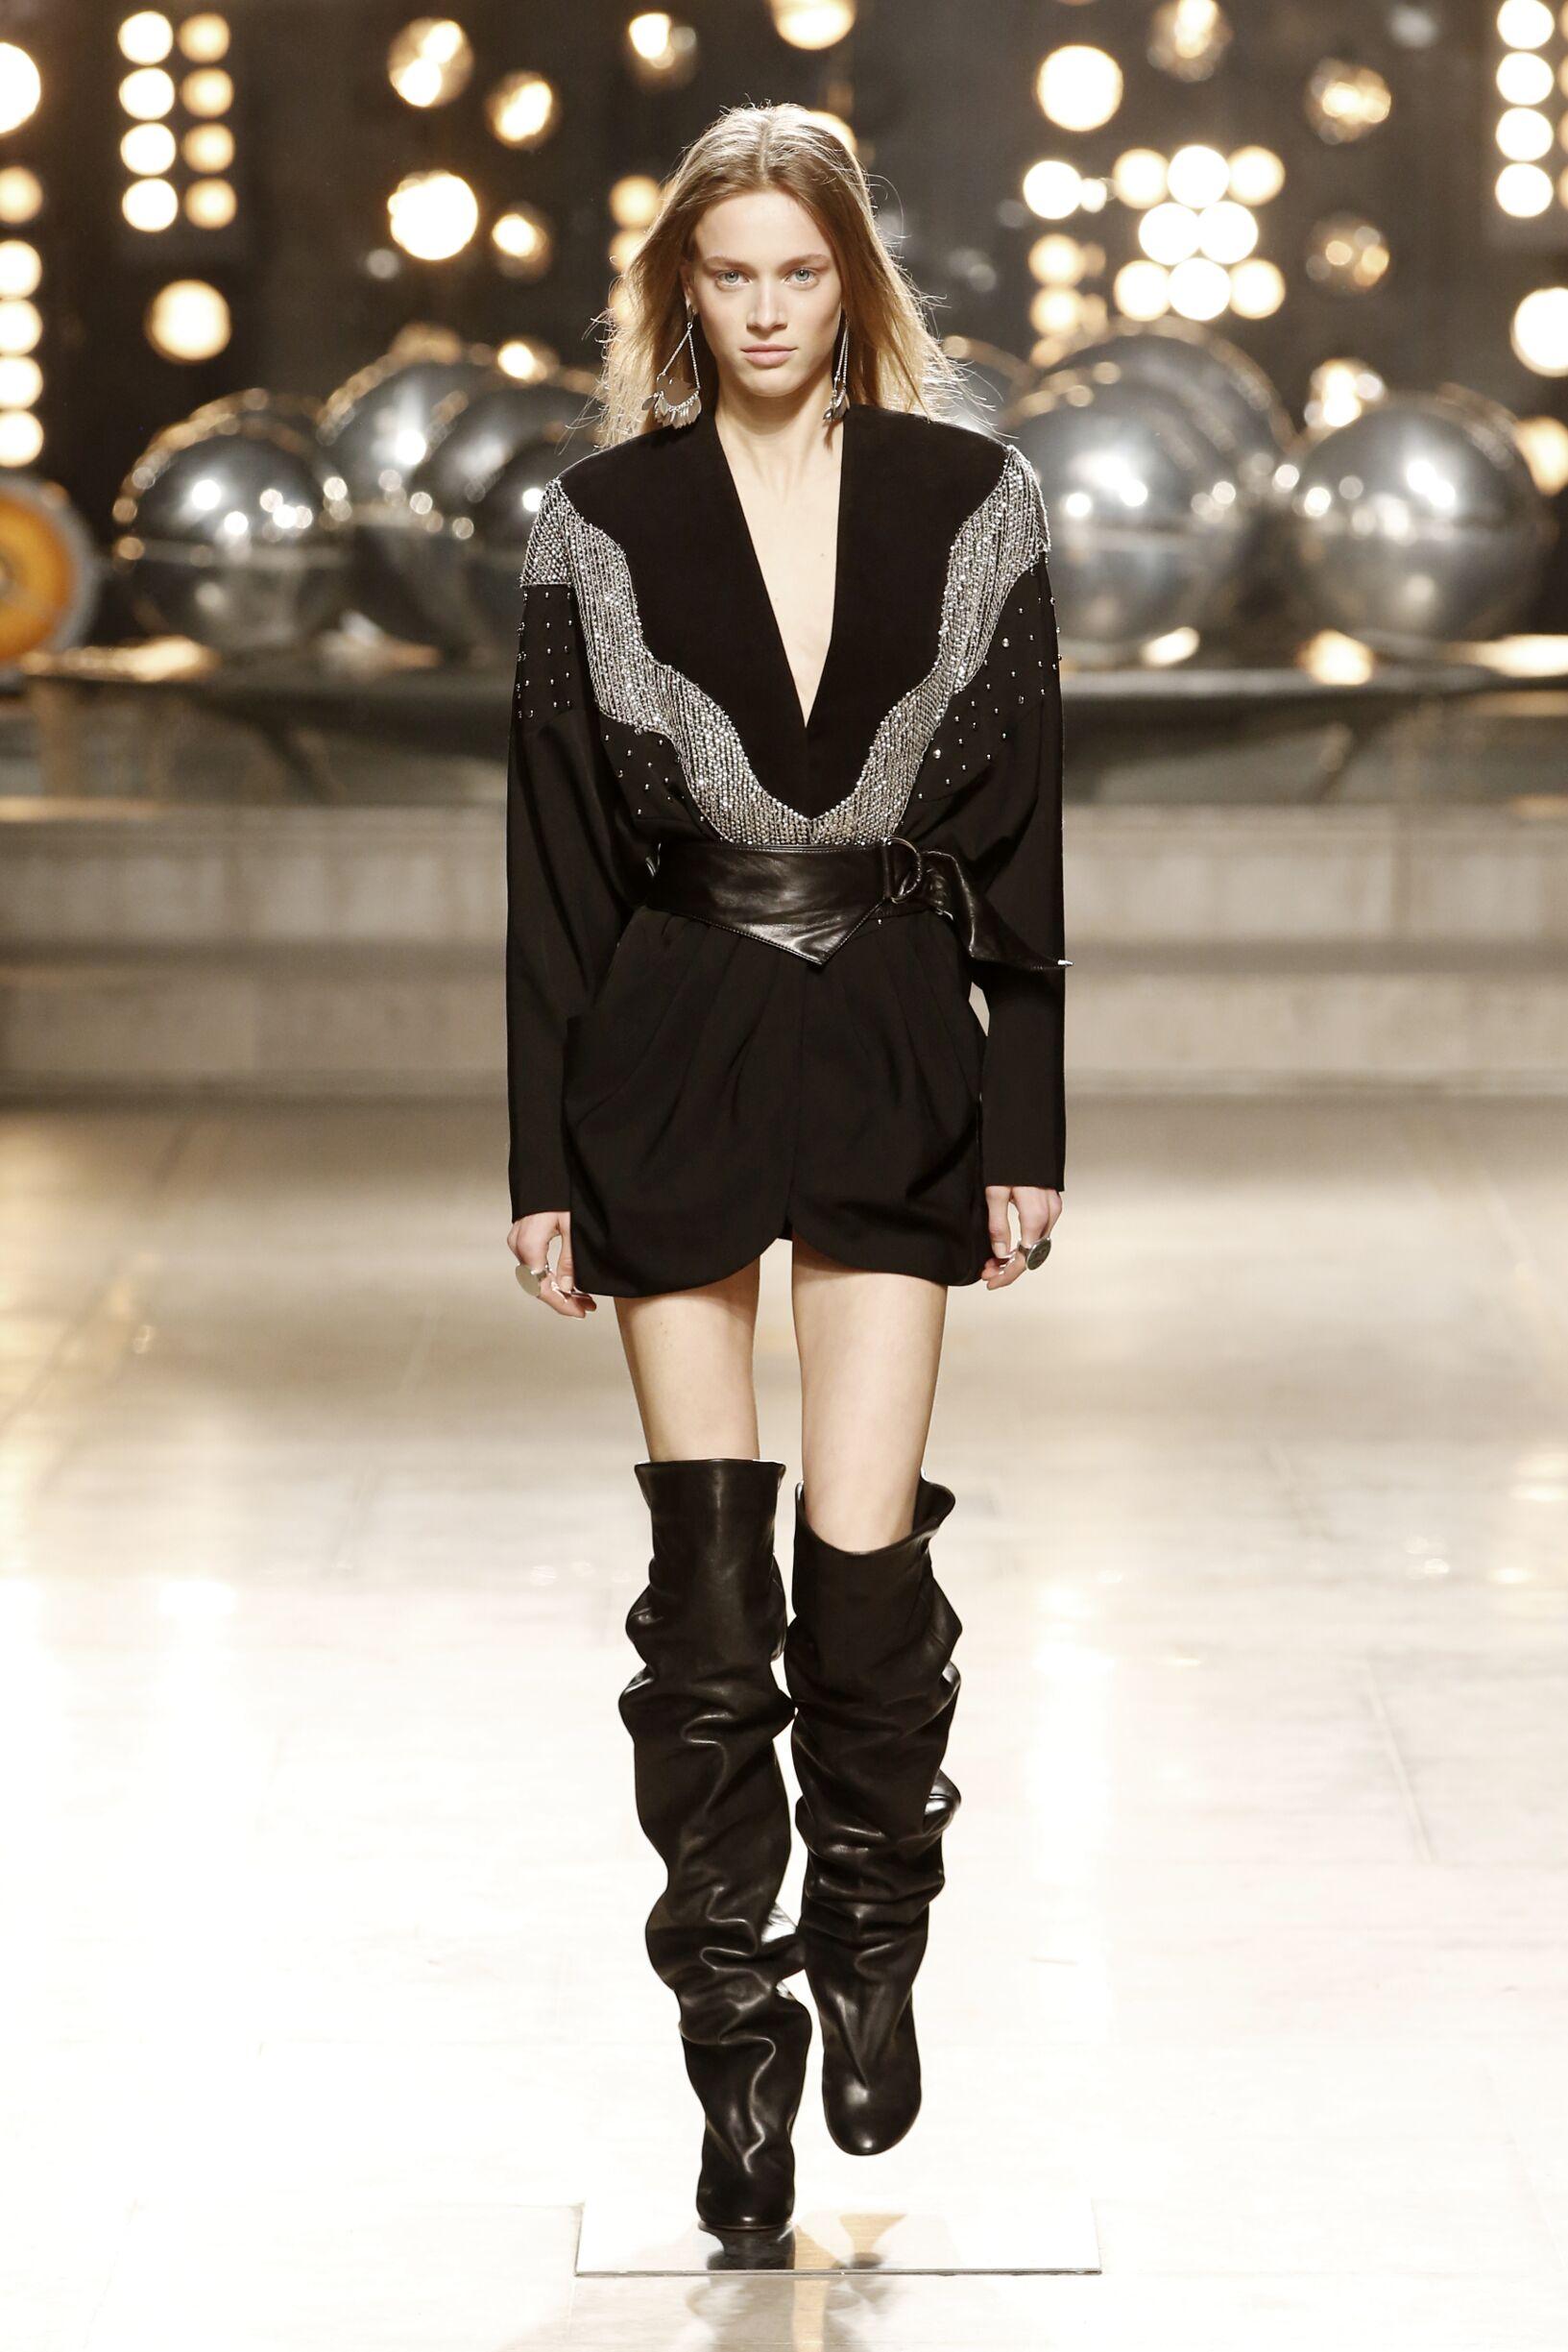 2019 Isabel Marant Catwalk Paris Fashion Week